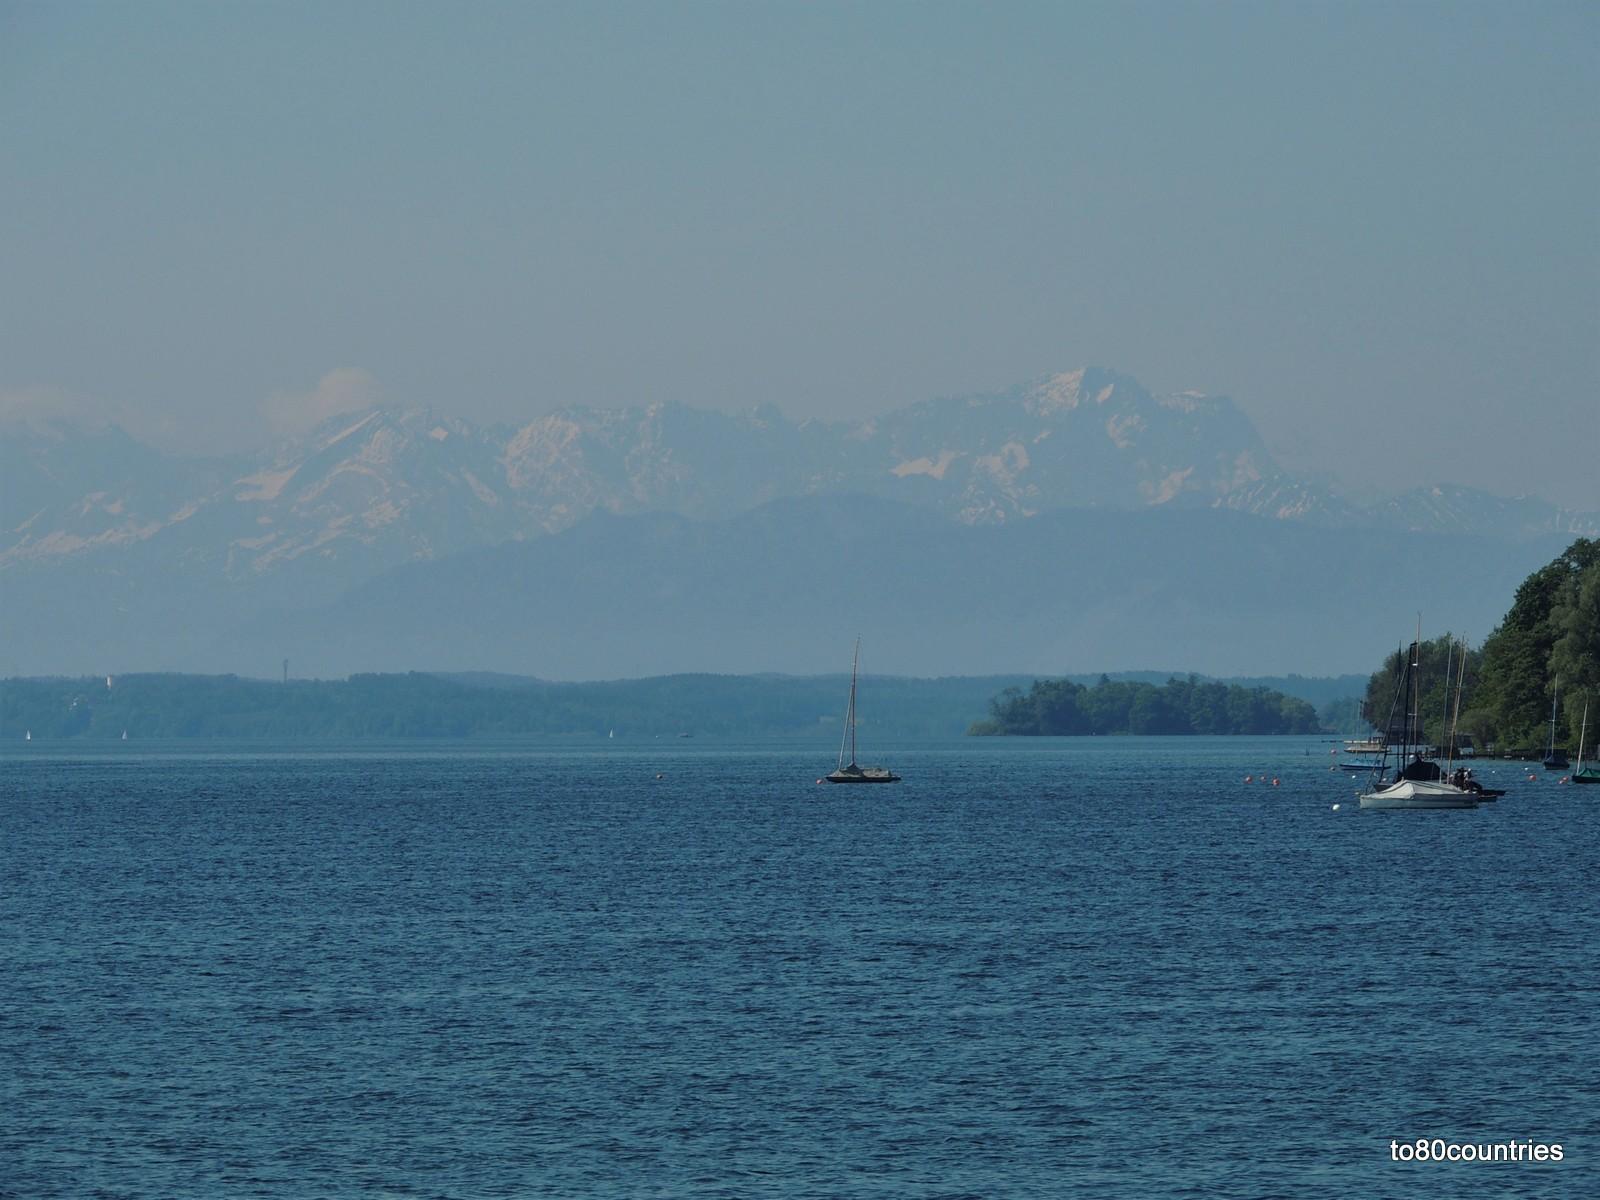 Starnberger See - Kurs auf die Roseninsel